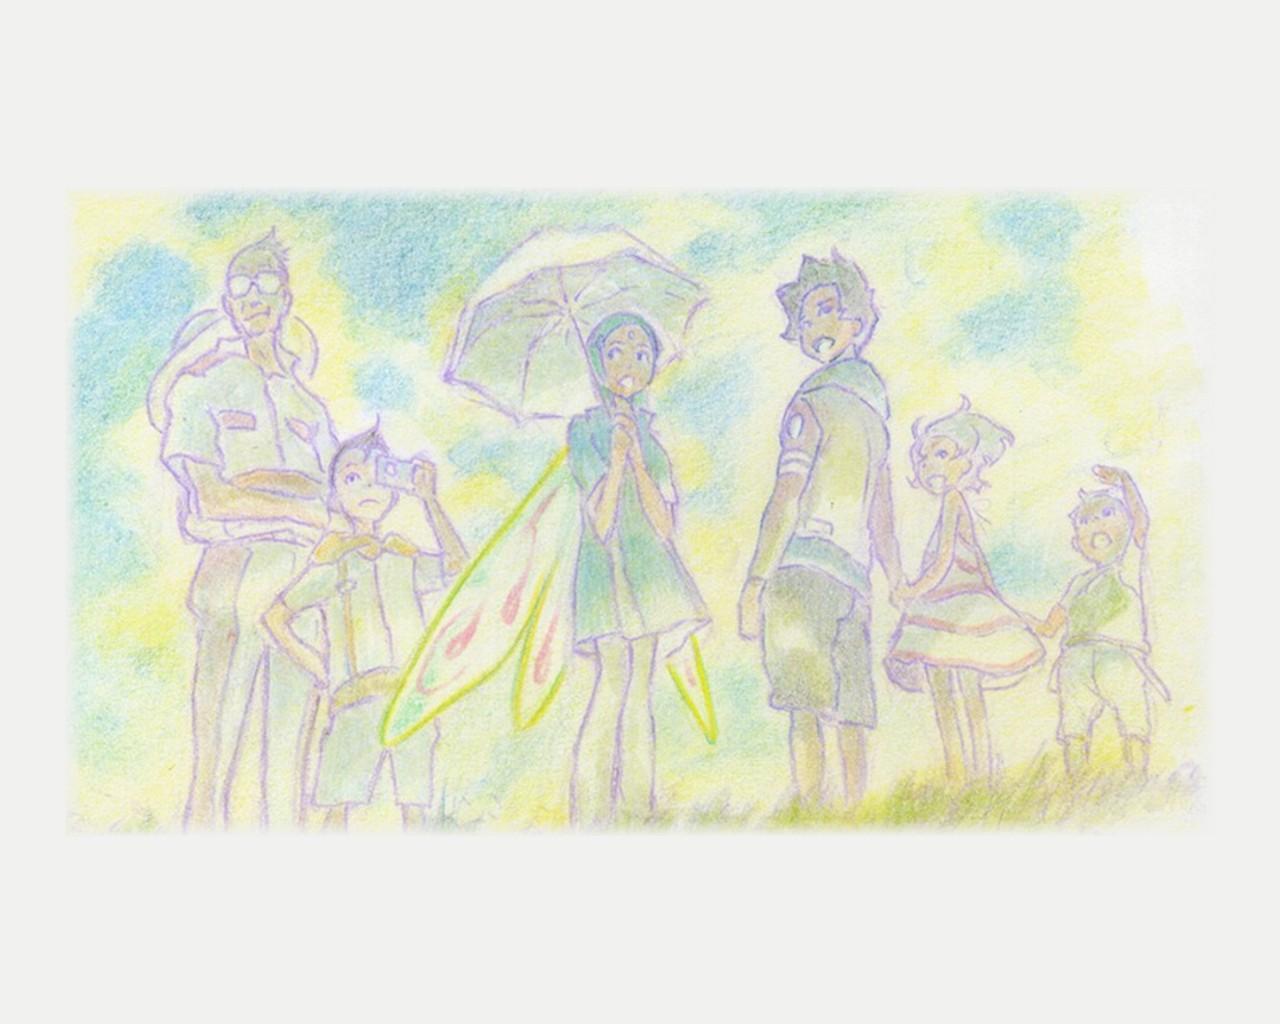 axel_thurston eureka eureka_seven link maeter maurice renton_thurston umbrella wings